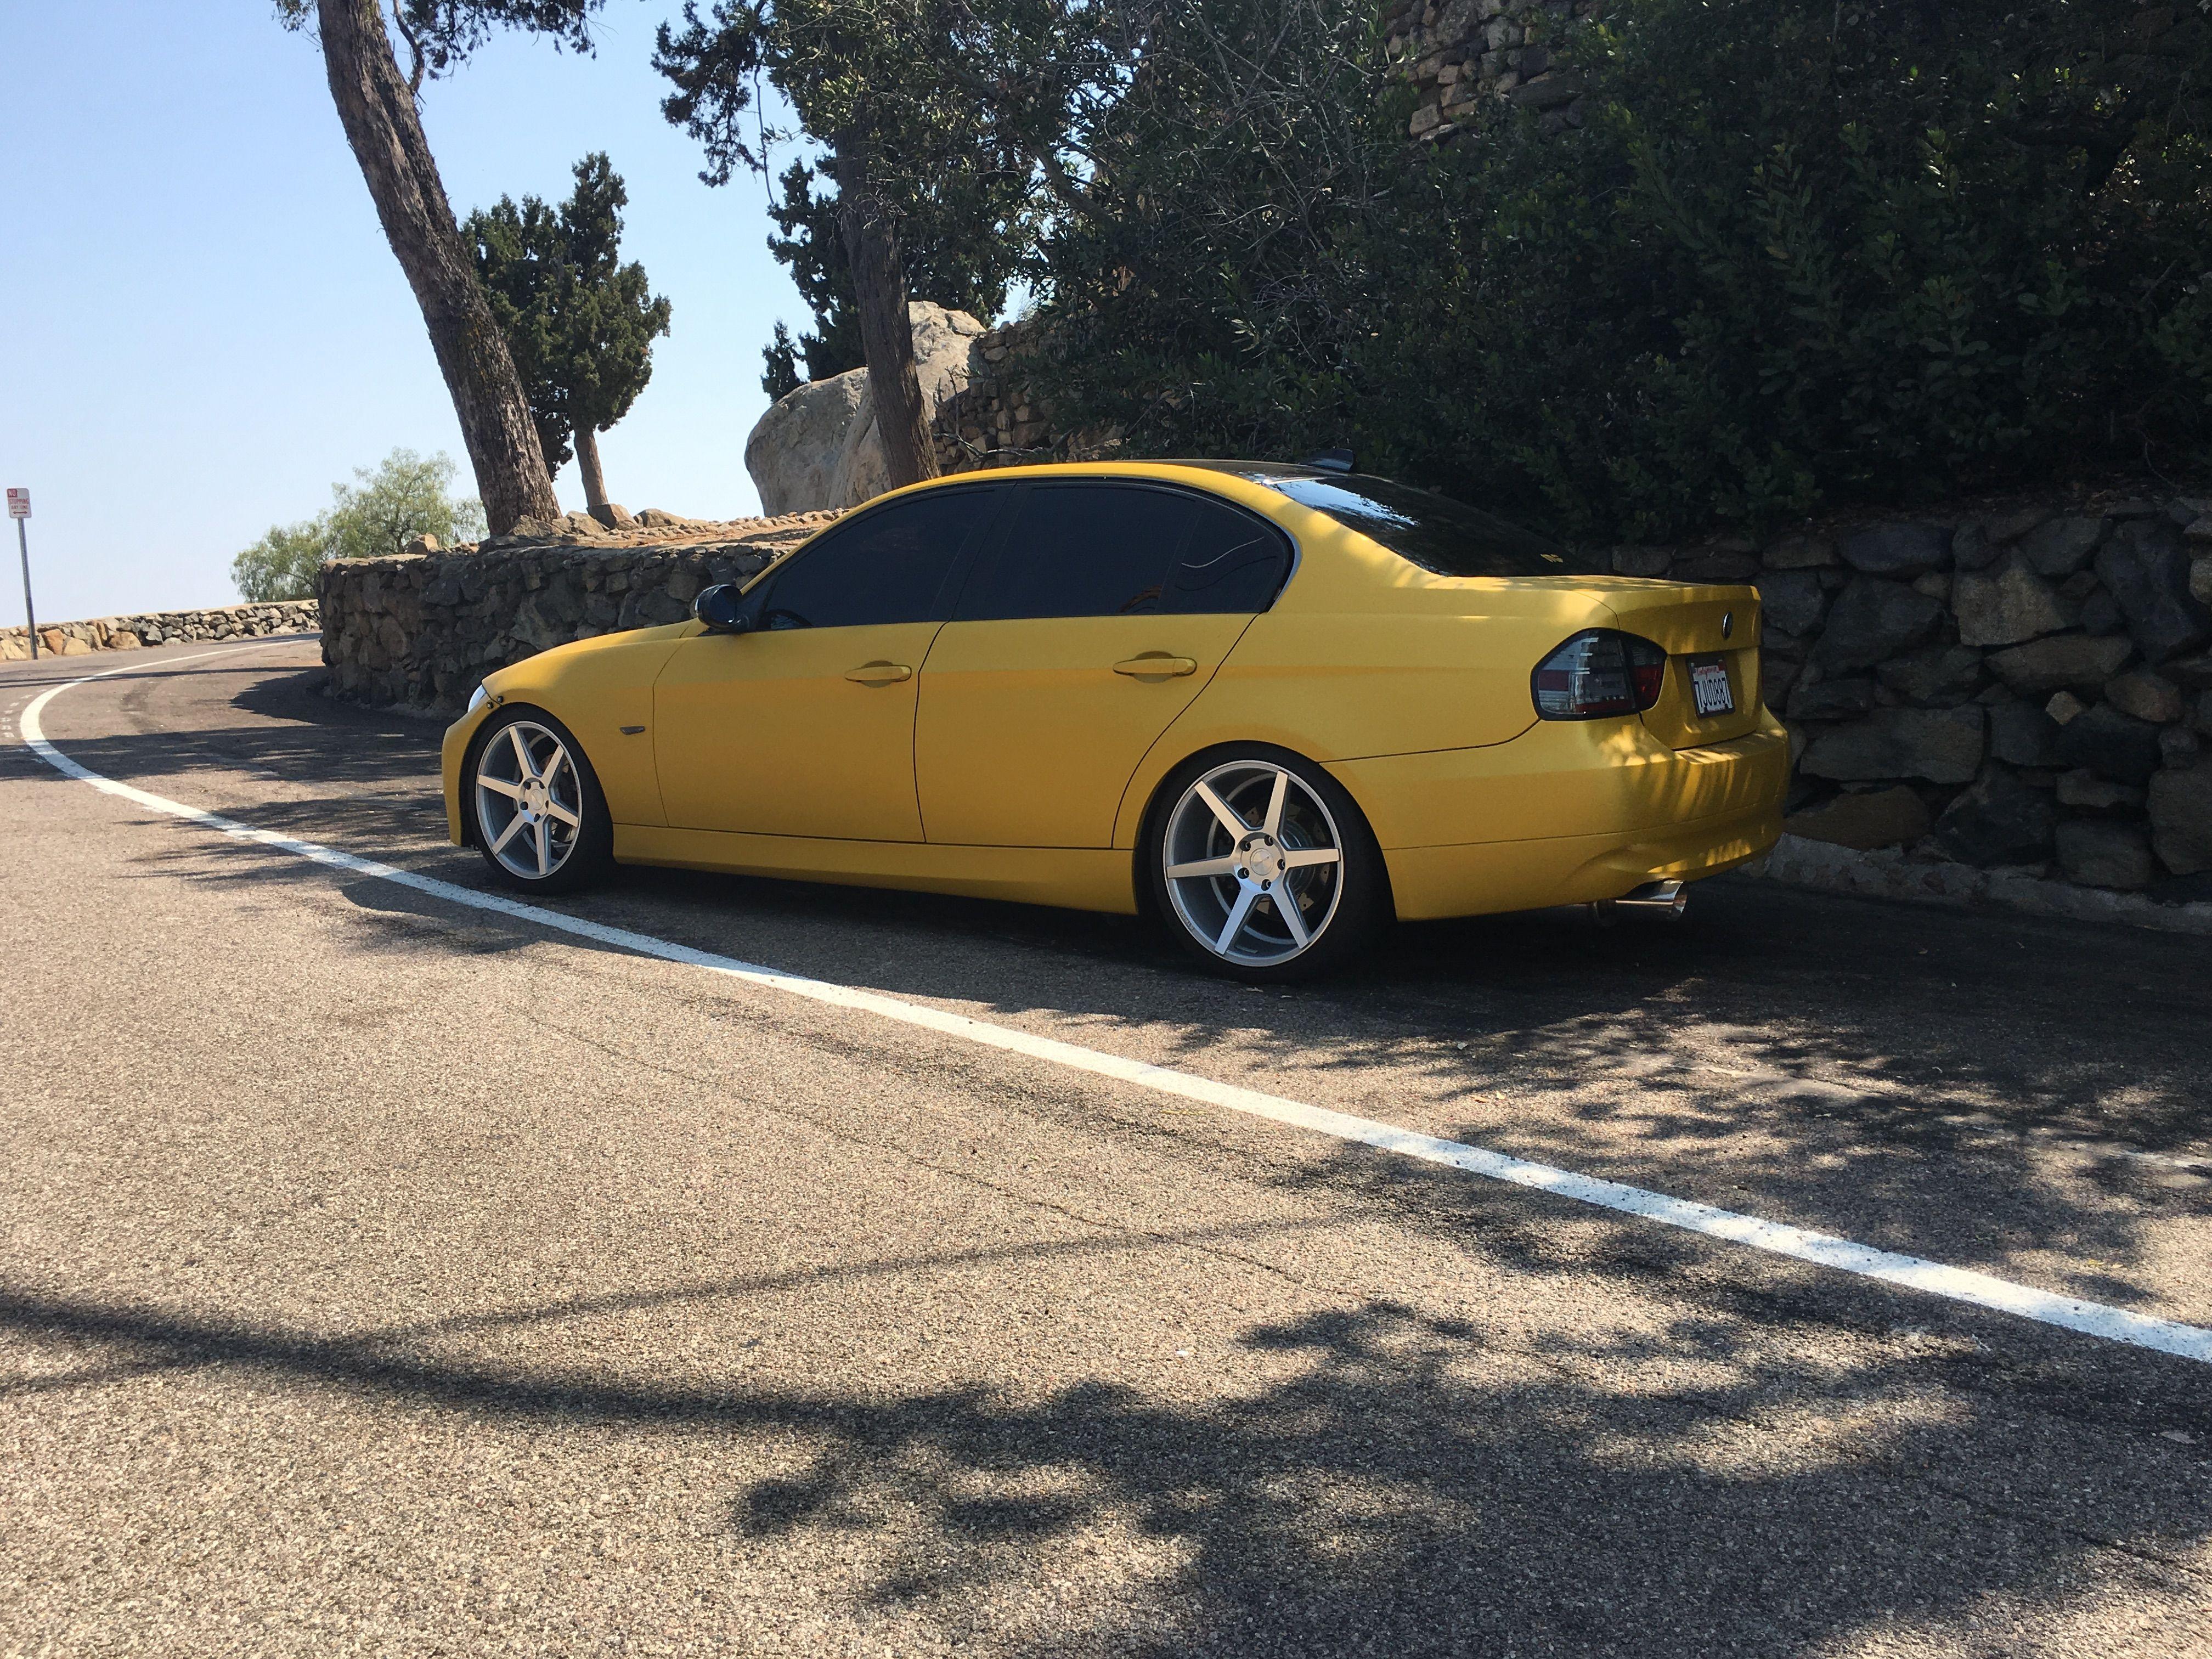 Heatwave yellow E90 BMW full vinyl wrap